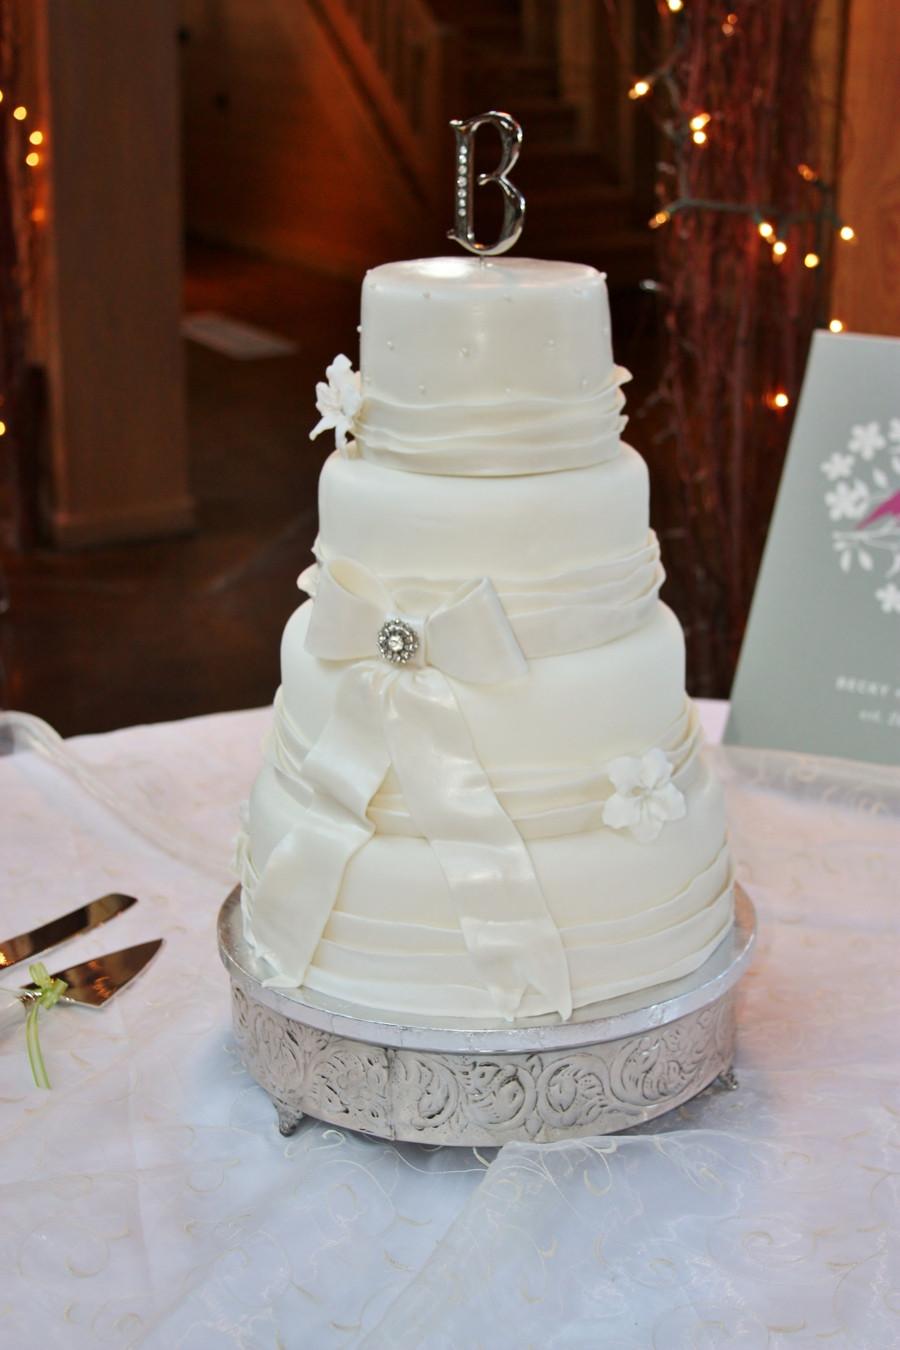 Vintage Wedding Cakes Pictures  Simple Vintage Wedding Cake CakeCentral